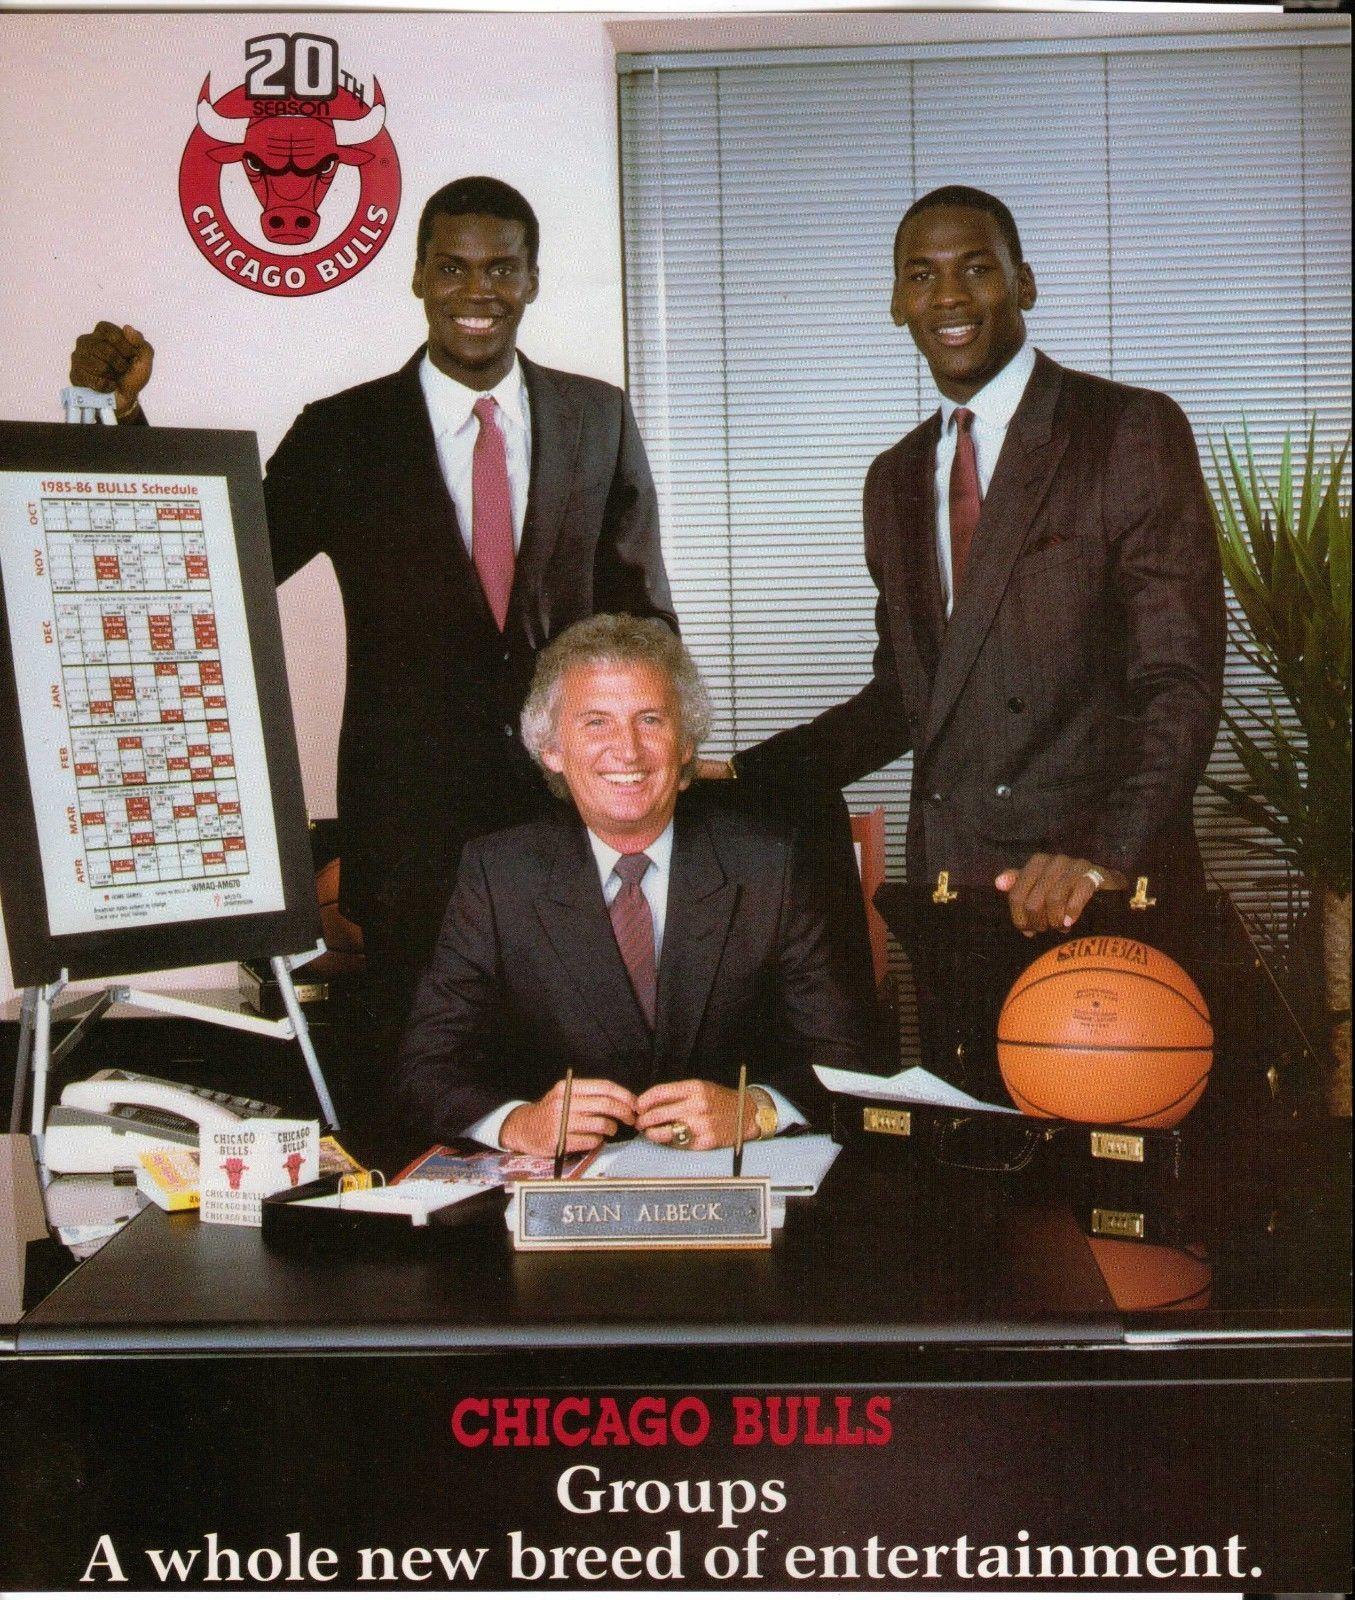 1985 86 Chicago Bulls season ticket promo with Michael Jordan